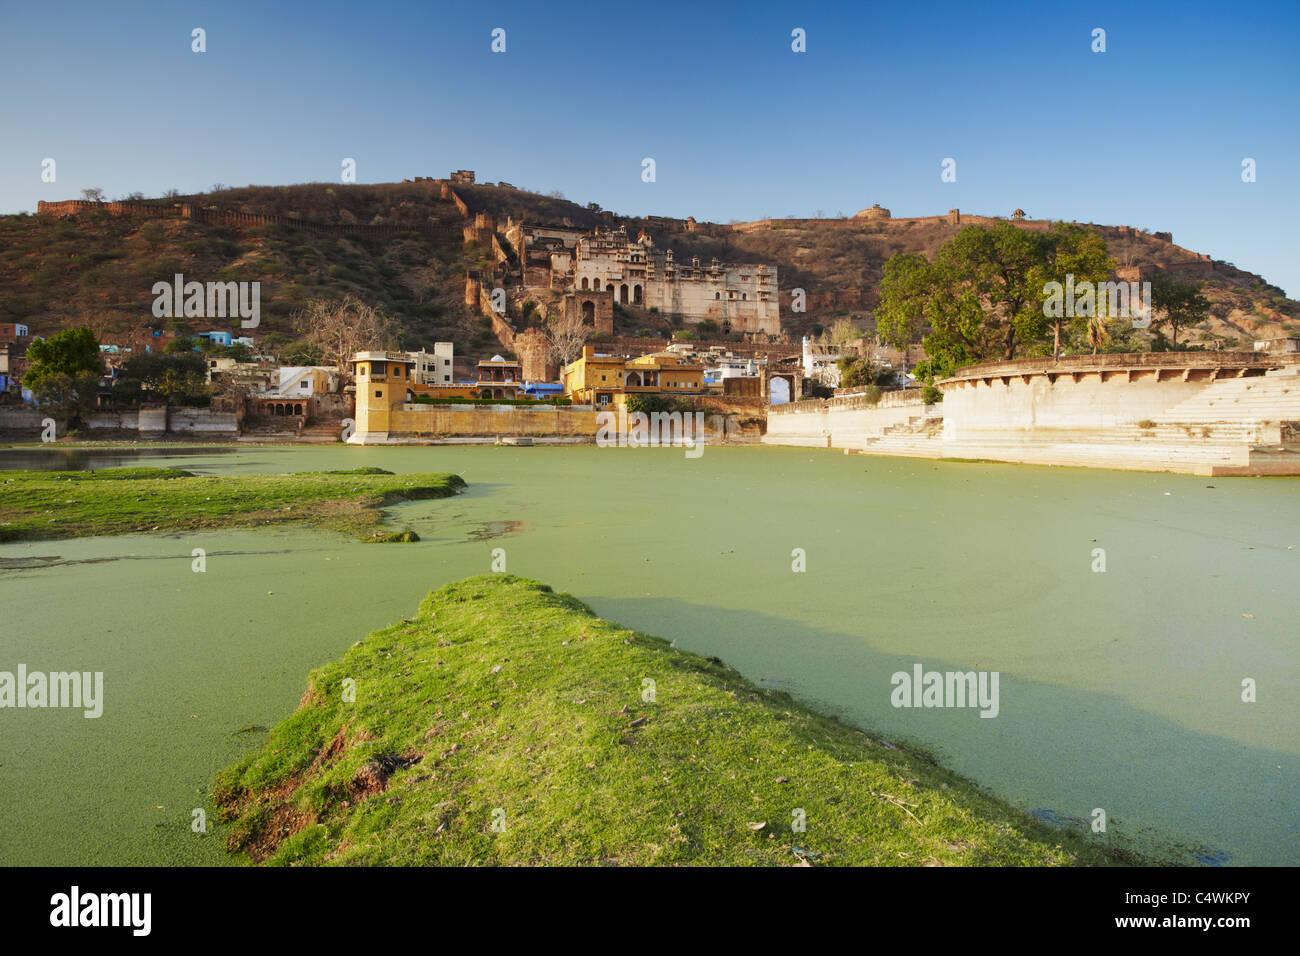 Bundi Palace and Taragarh (Star Fort), Bundi, Rajasthan, India - Stock Image